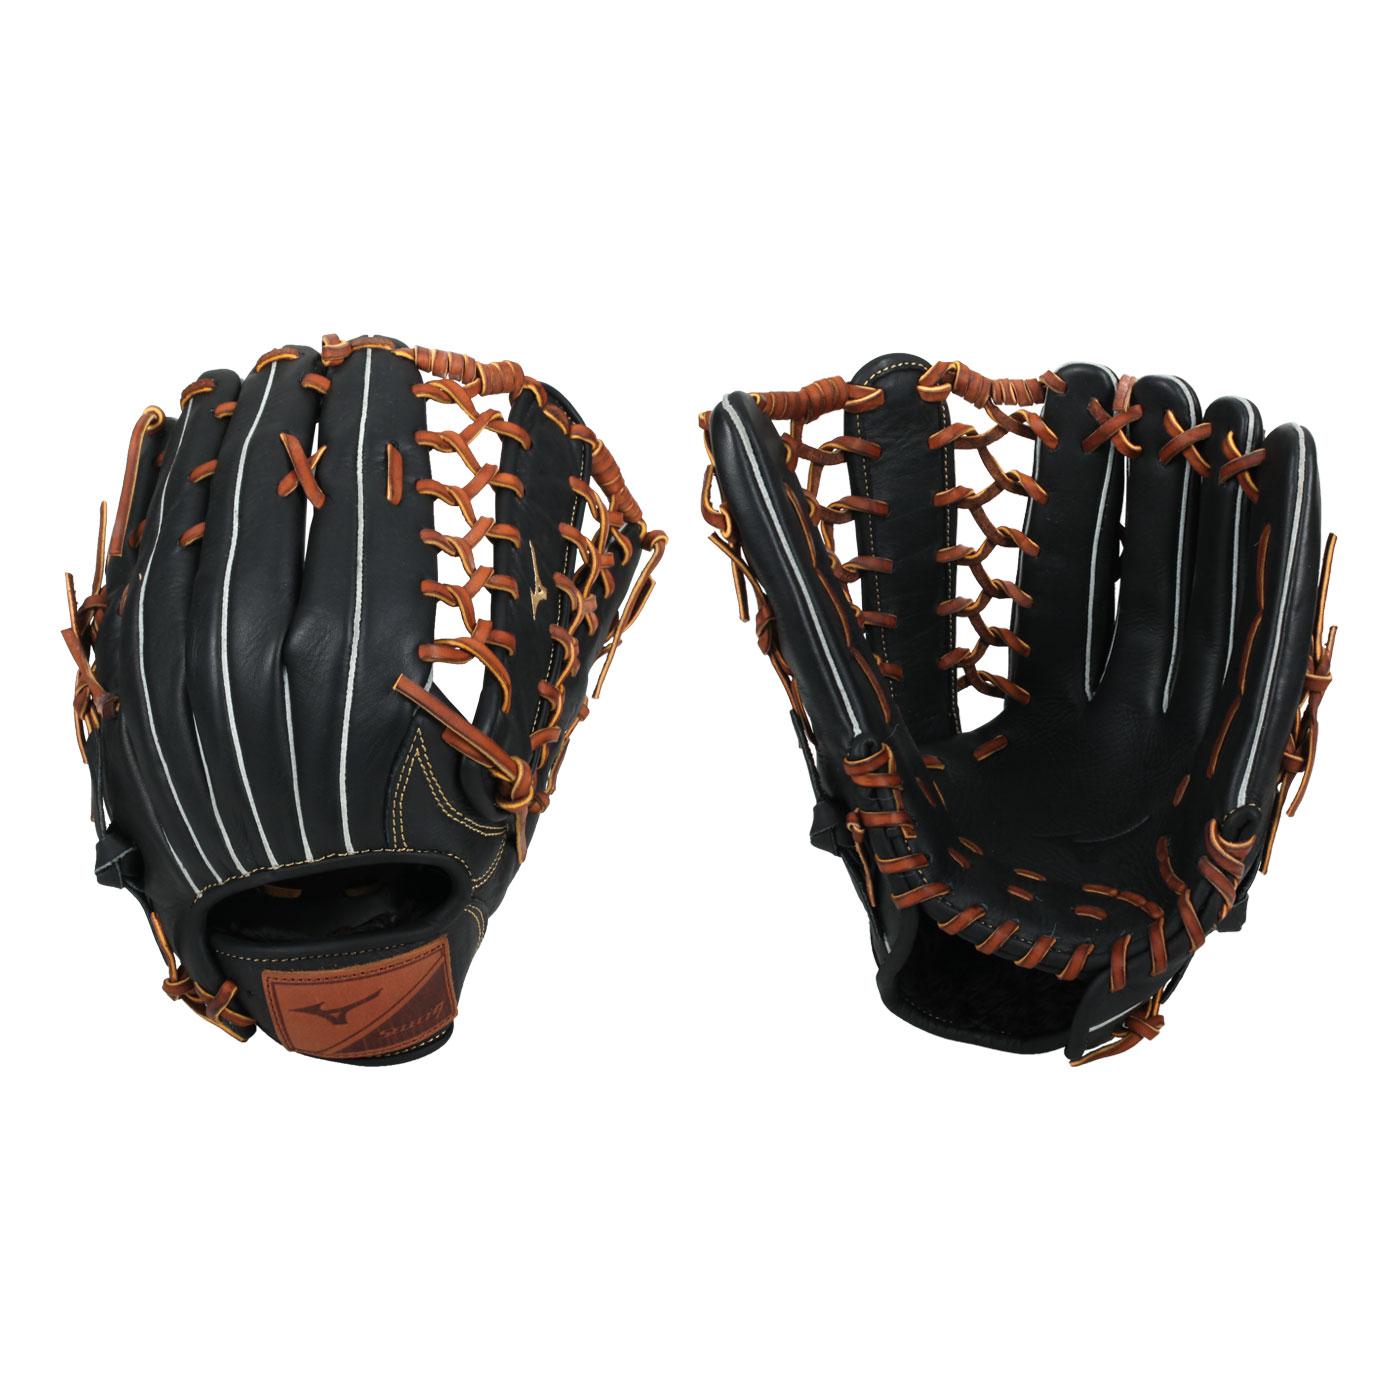 MIZUNO 棒球手套-右投 312849-R